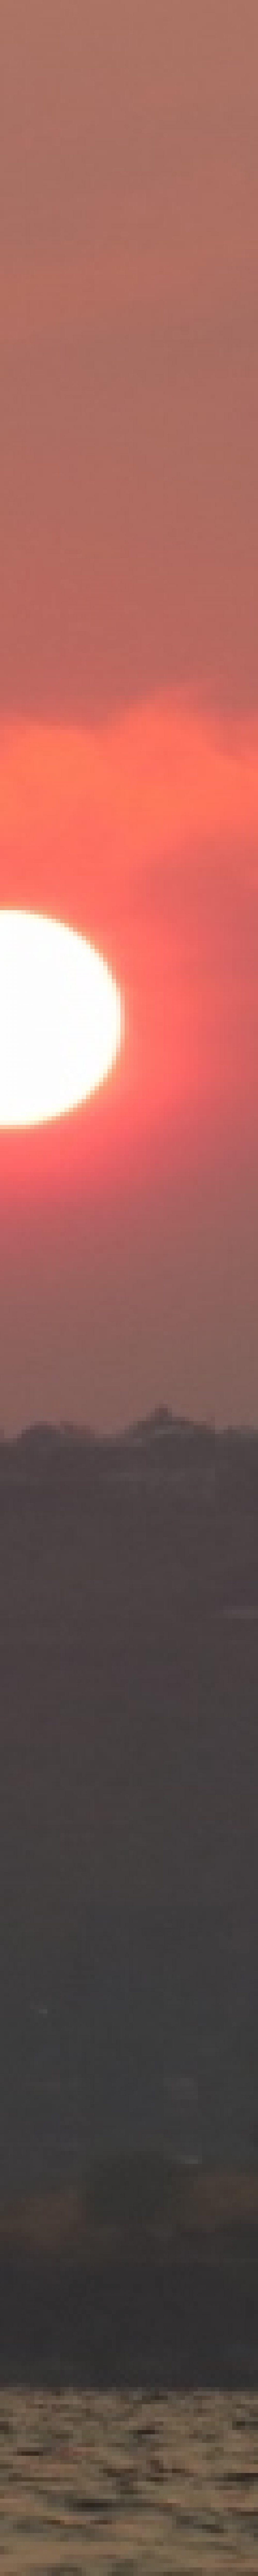 Sunrise over Kigoma - copyright Rupi Mangat